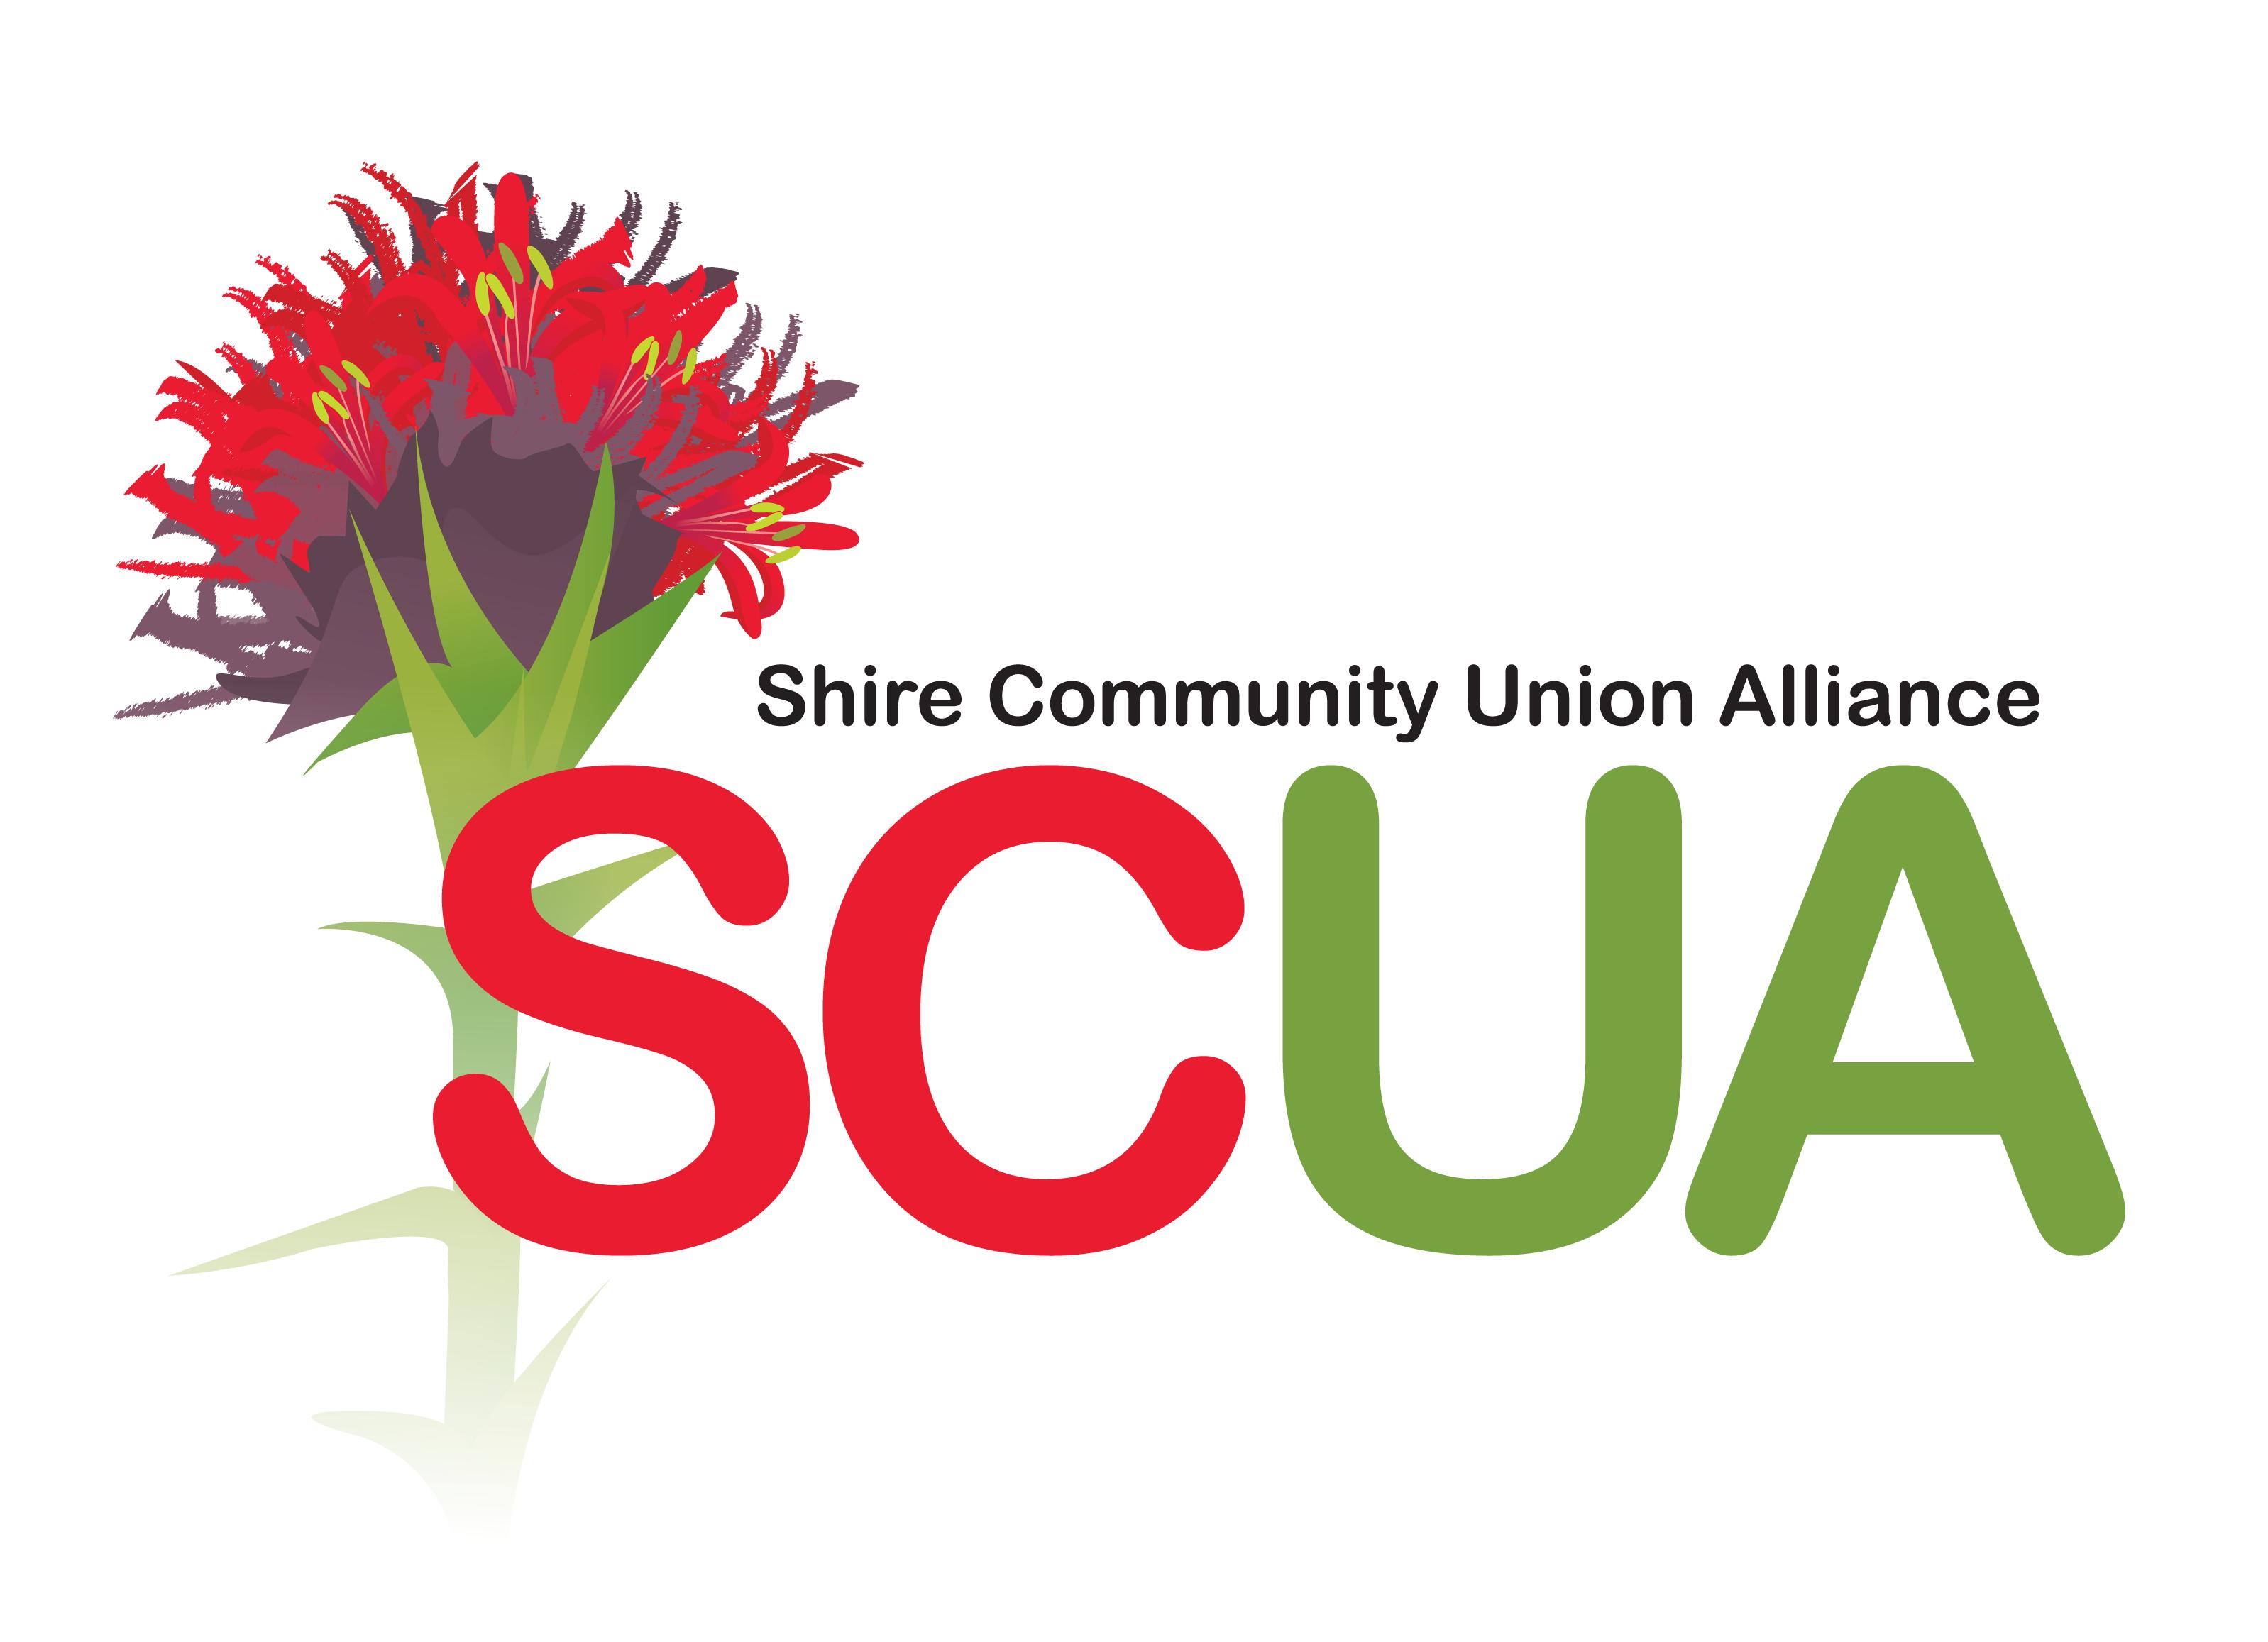 Logo_-_Shire_Community_Union_Alliance_SCUA.jpg